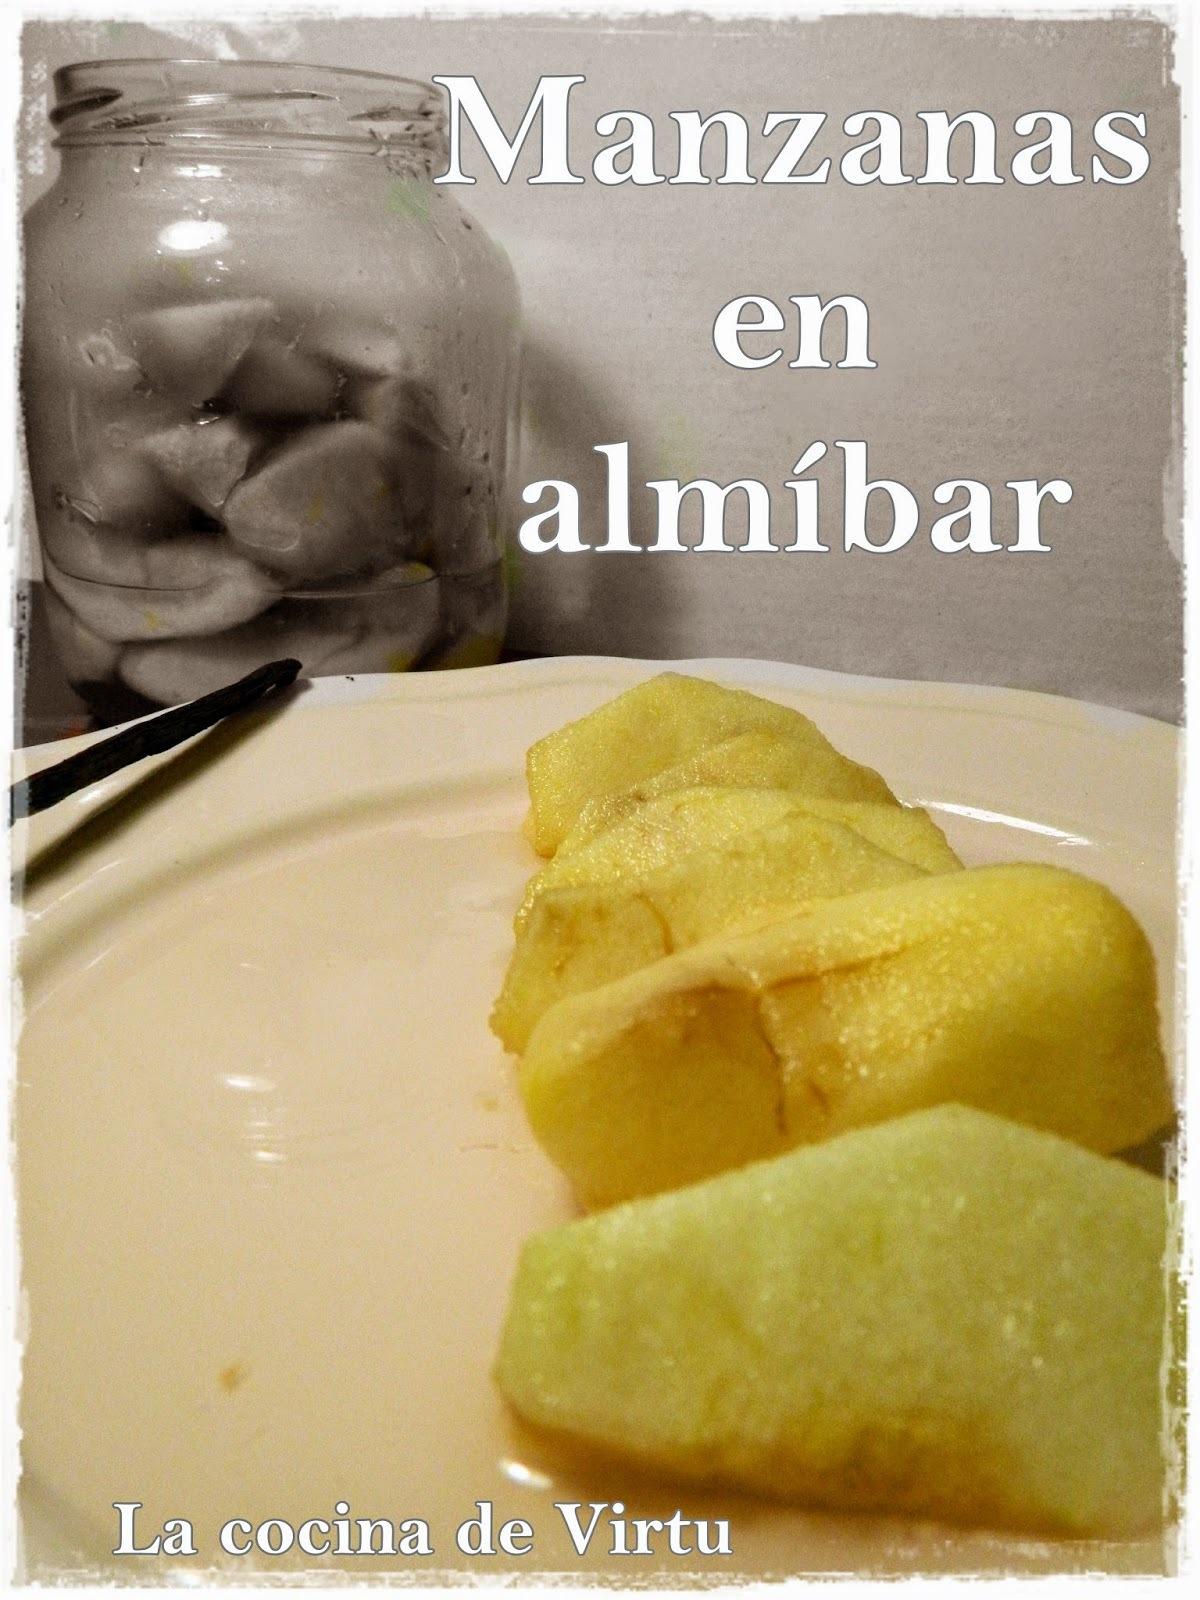 Conserva manzana en almibar al microondas